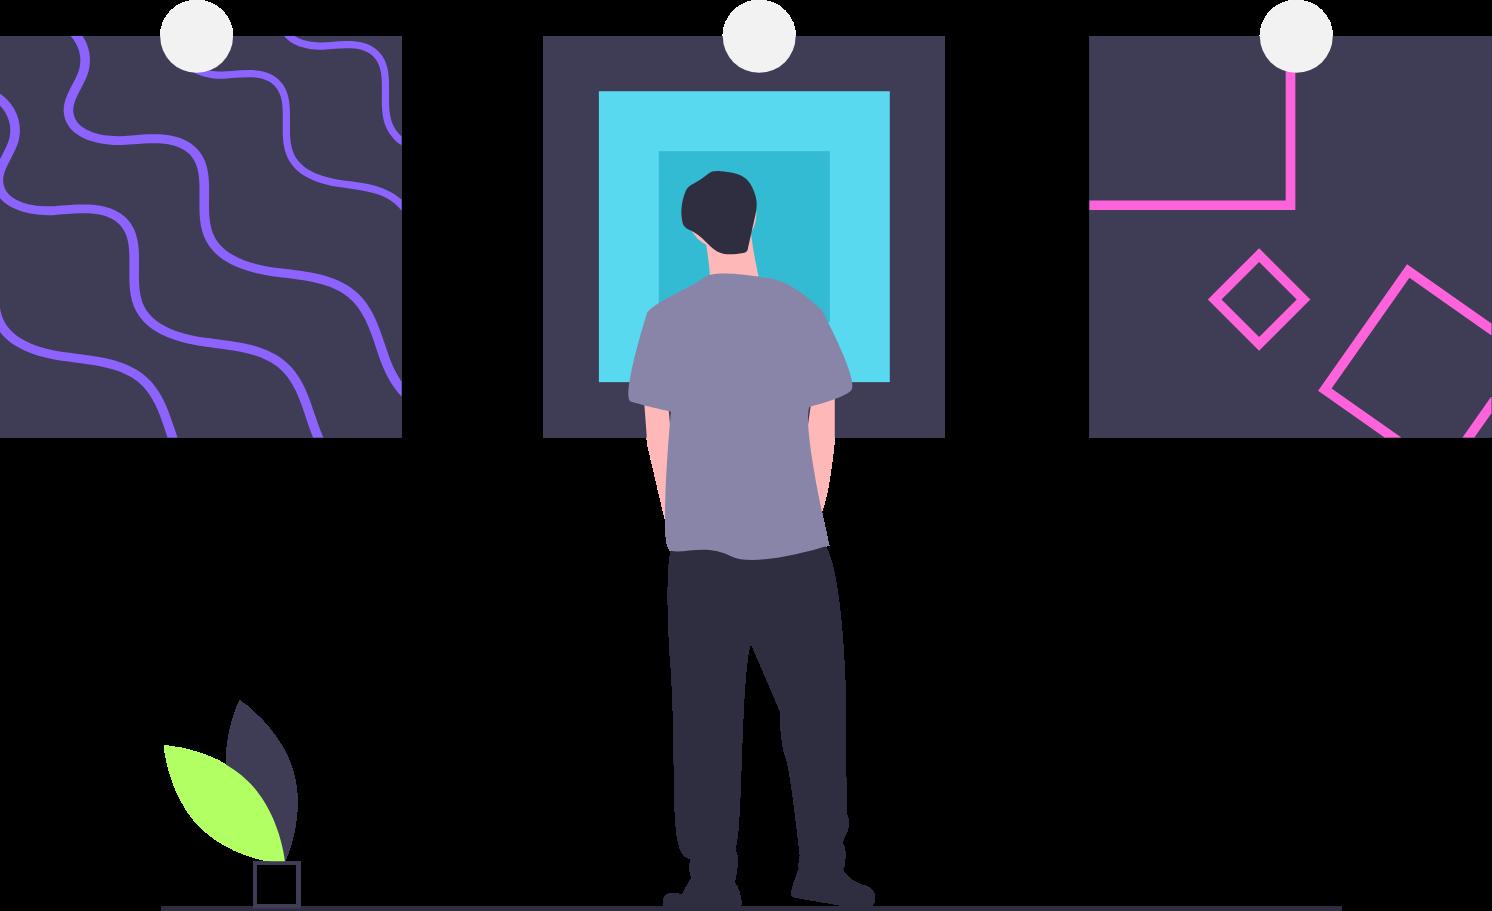 creativity and usability balance in design